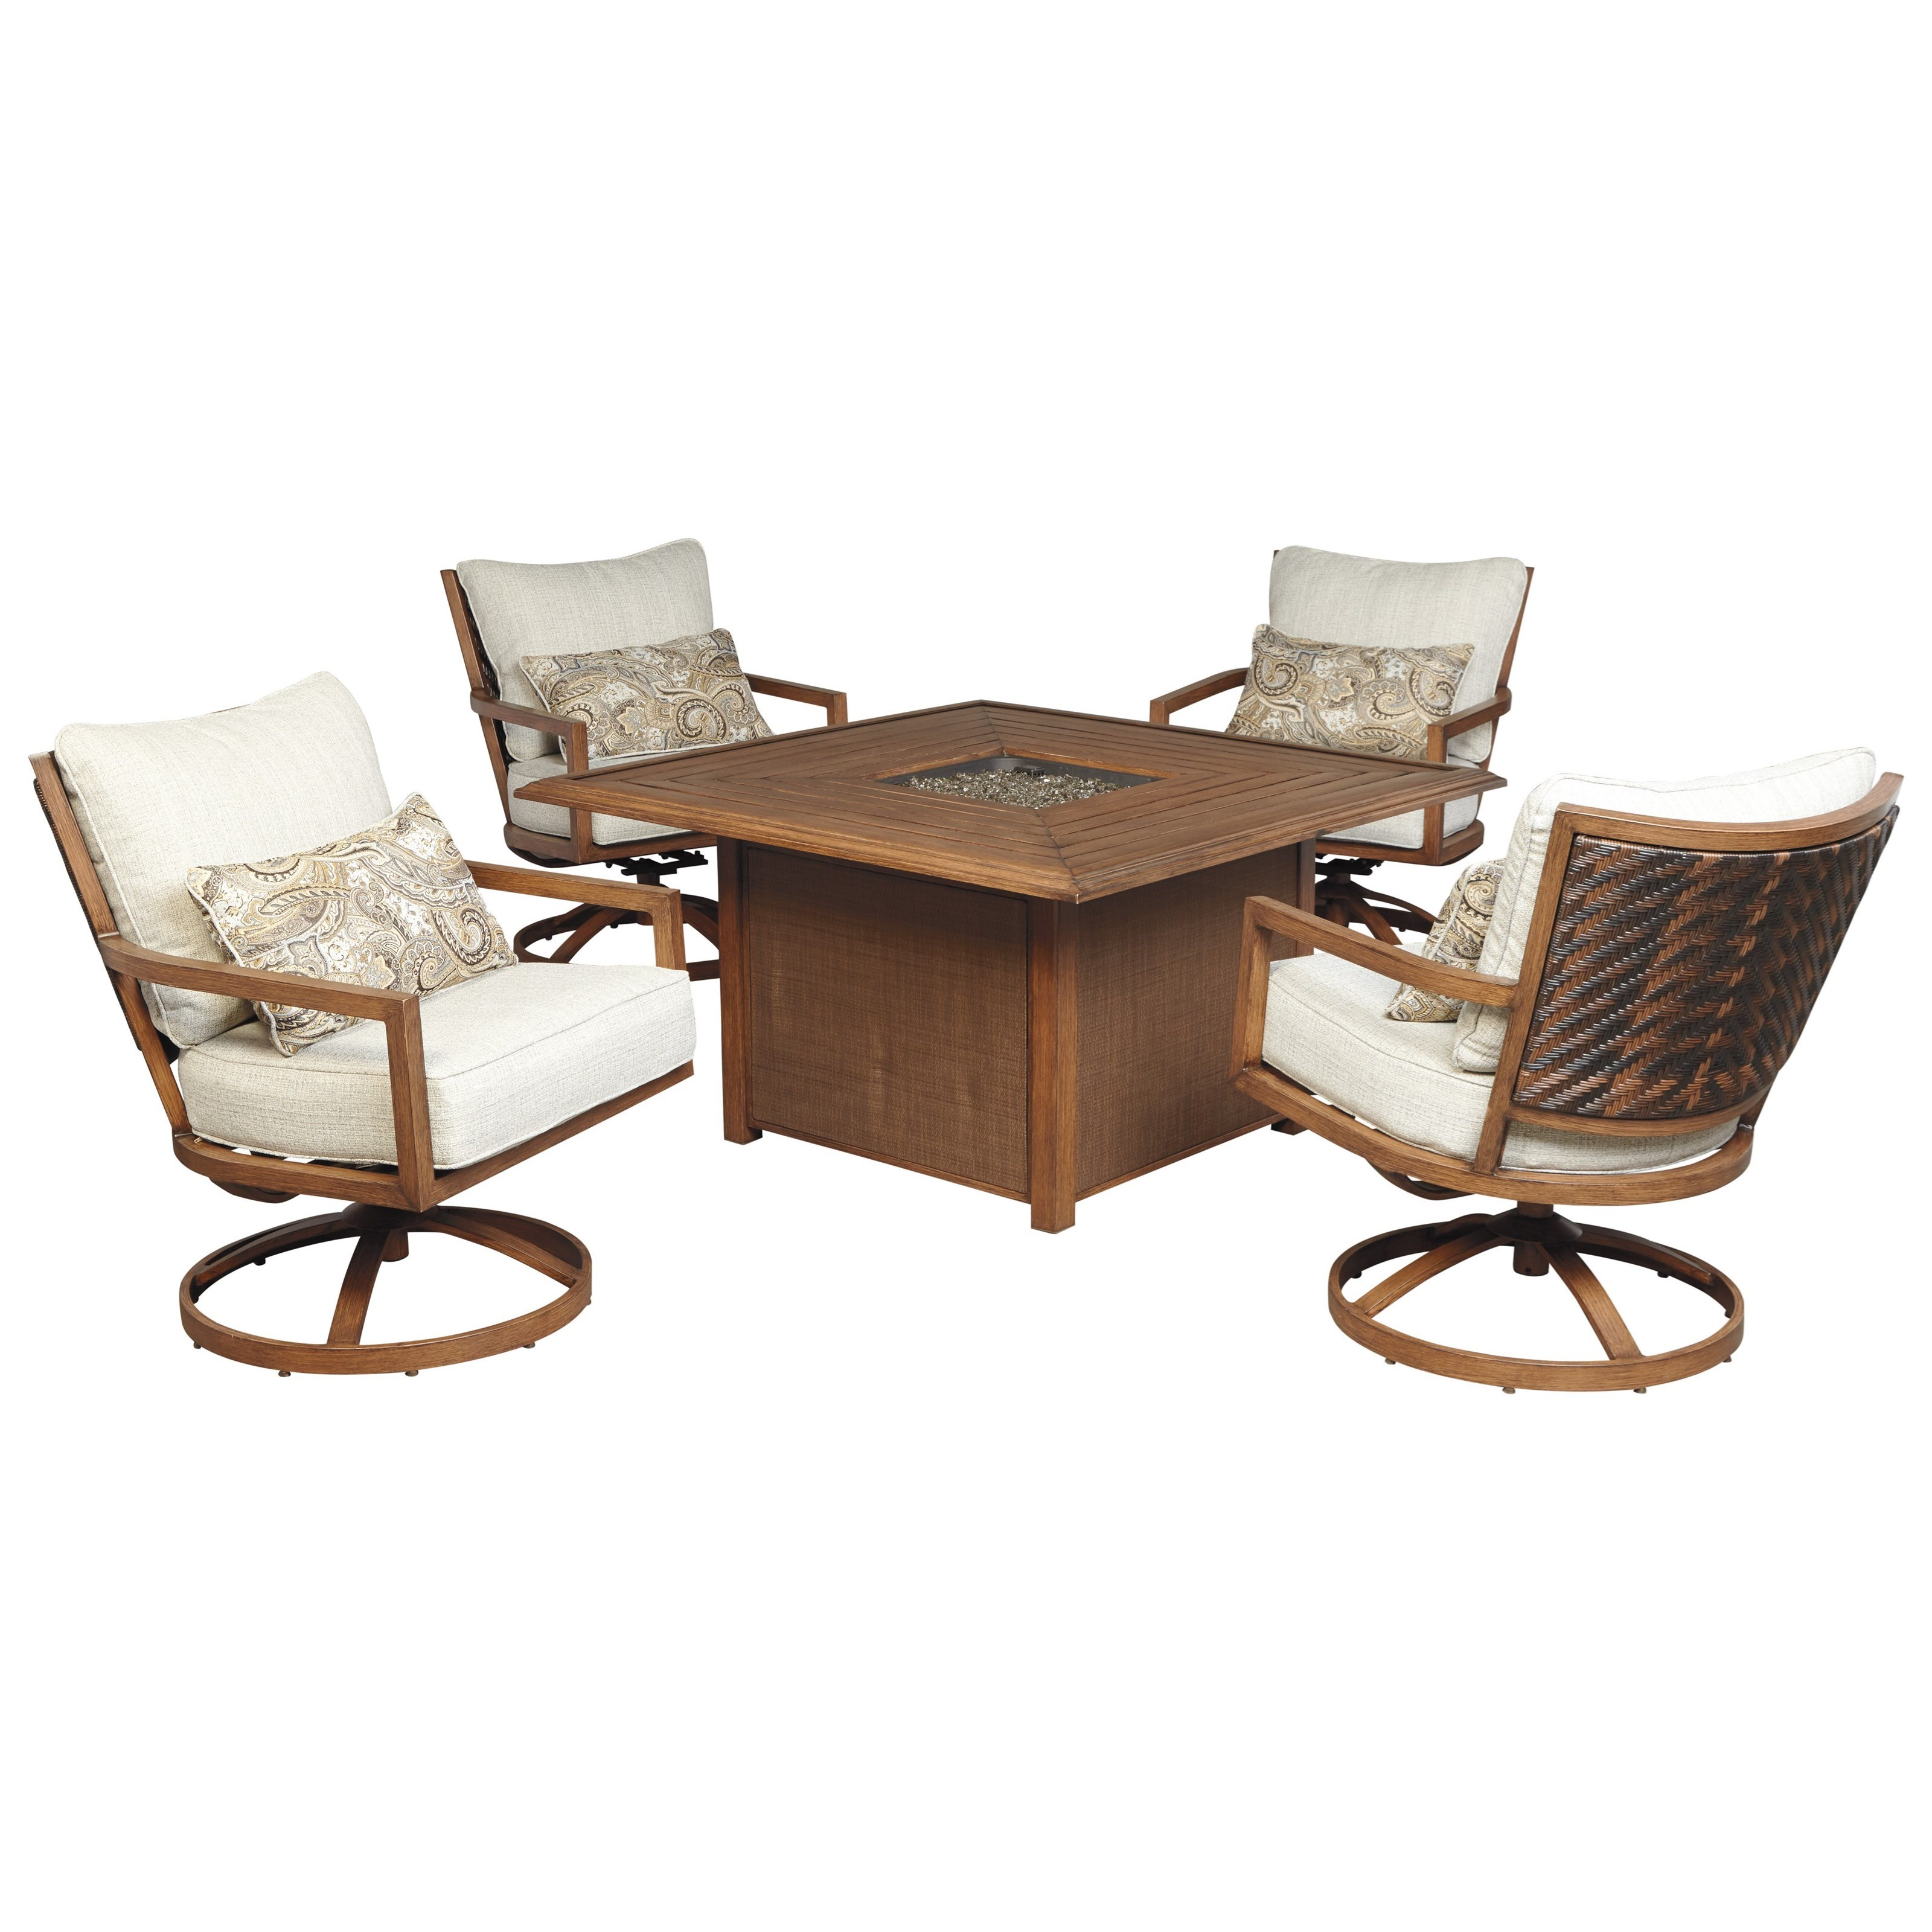 Signature Design by Ashley Zoranne 5-Piece Square Fire Pit Table Set - Item Number: P764-772+2x821